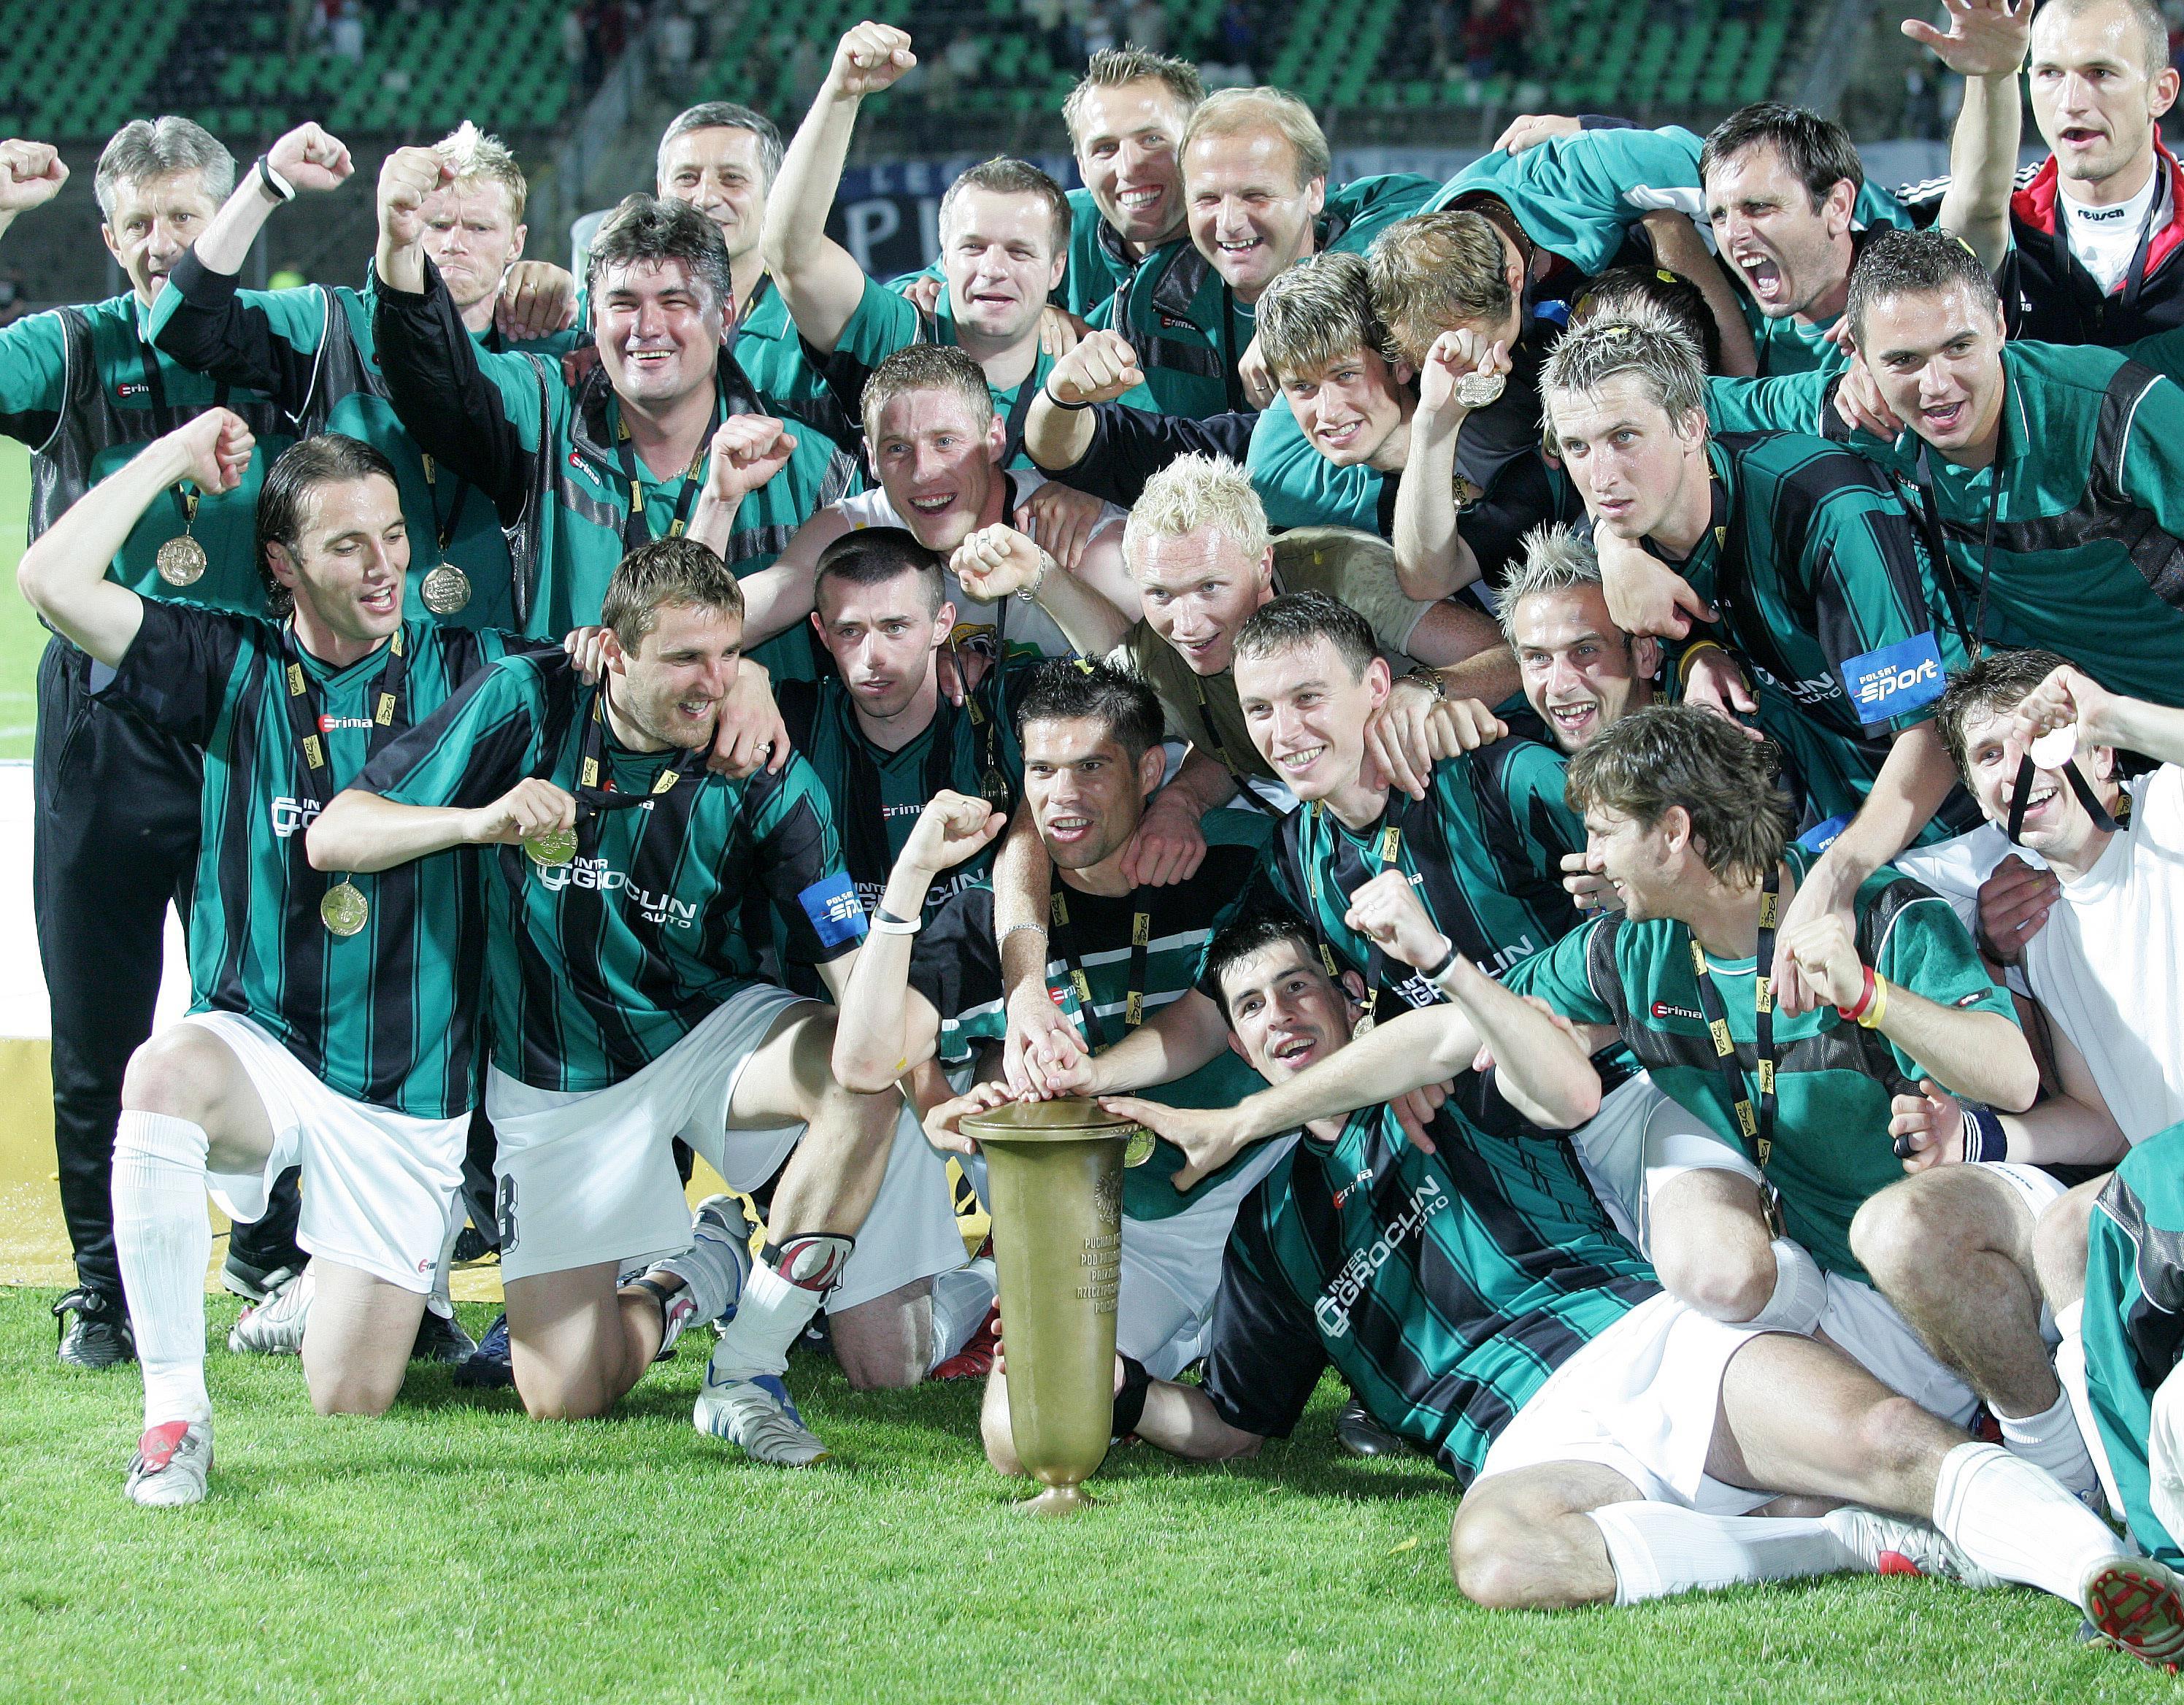 Nasza Dyskobolia i Puchar Polski